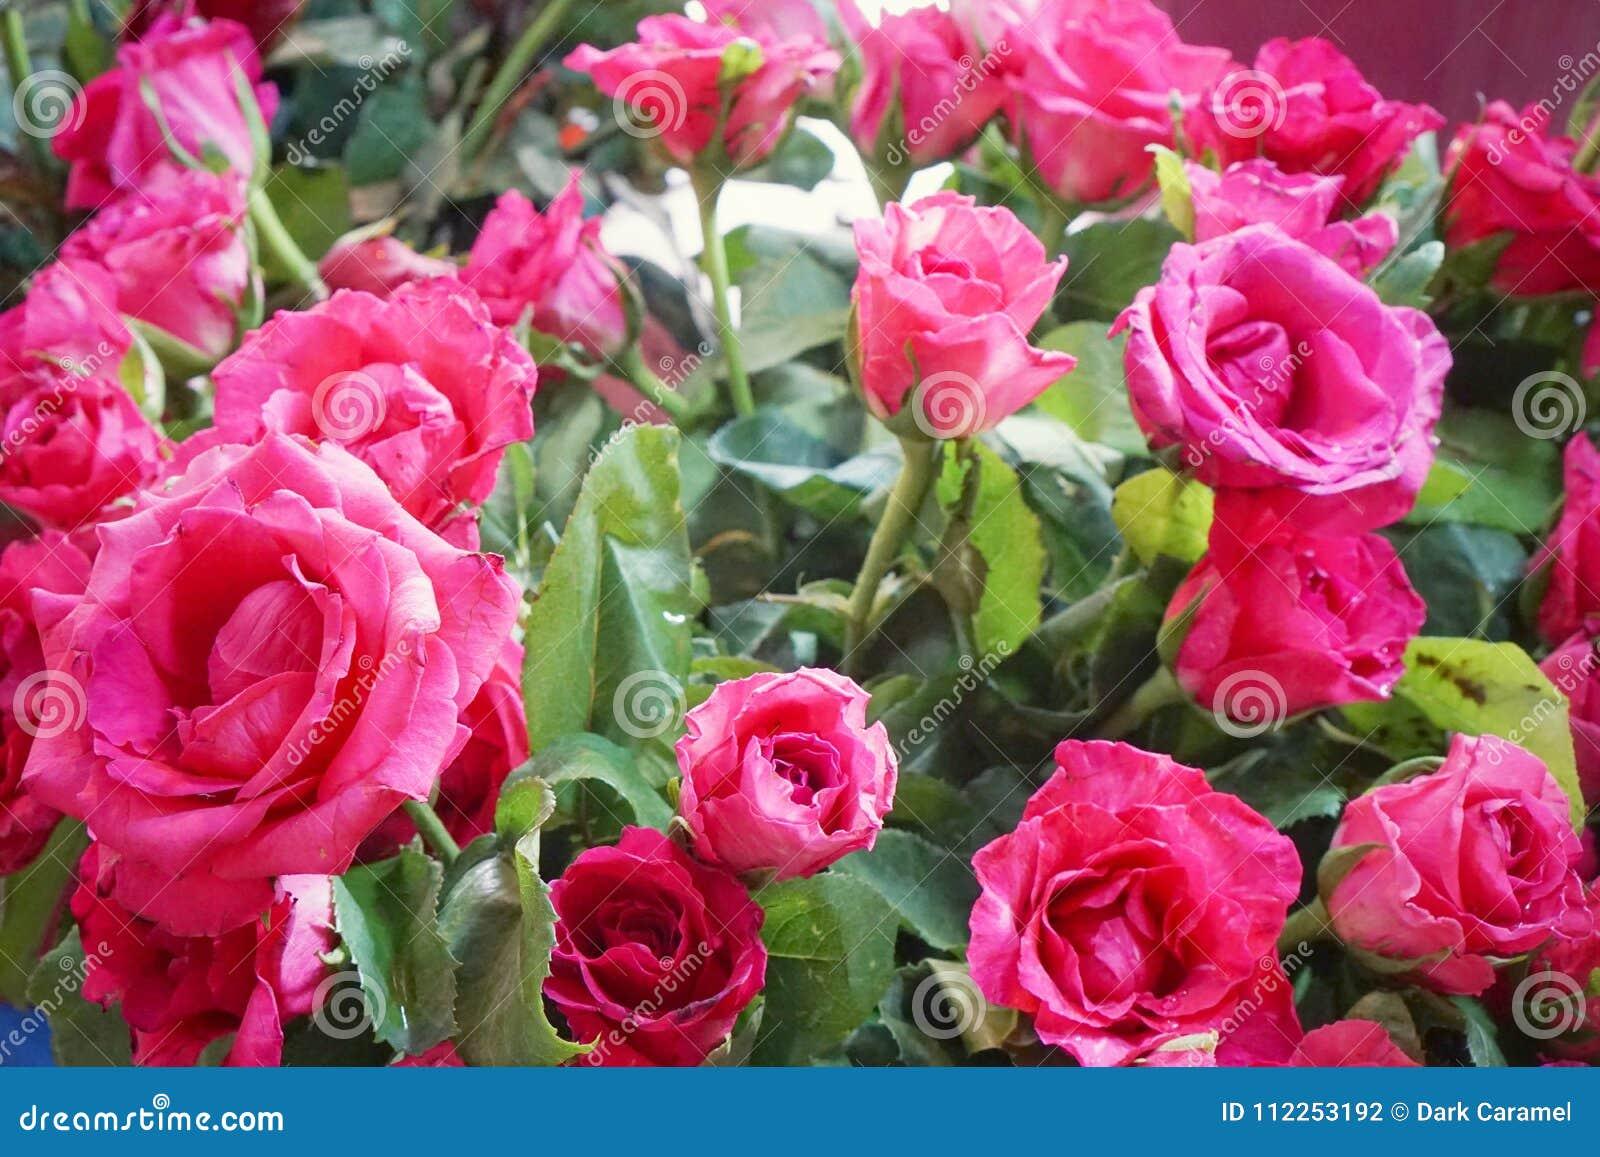 Beautiful big pink roses flower wedding decoration stock - Big rose flower wallpaper ...